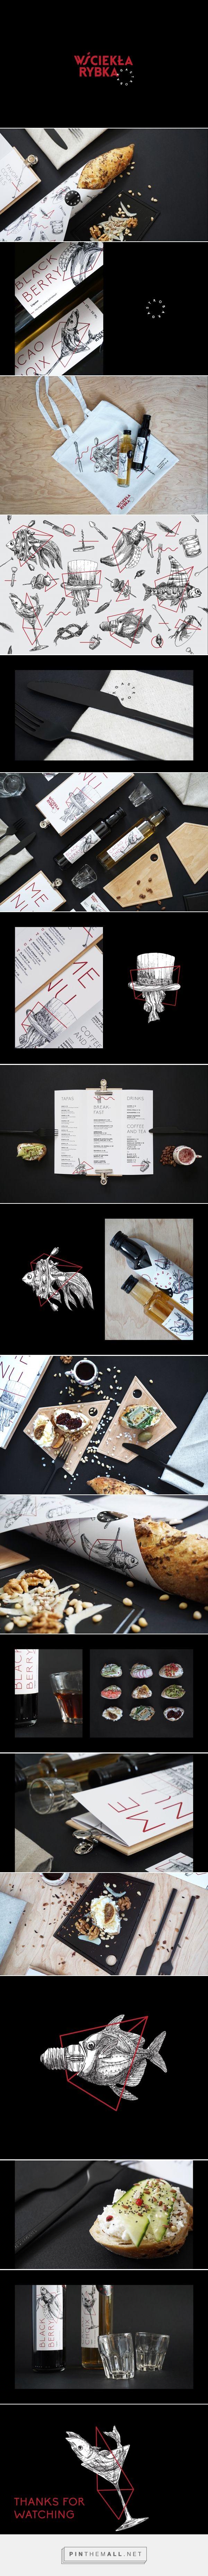 Wściekła rybka Gastro Bar Branding by Aleksandr Gusakov | Fivestar Branding Agency – Design and Branding Agency & Curated Inspiration Gallery